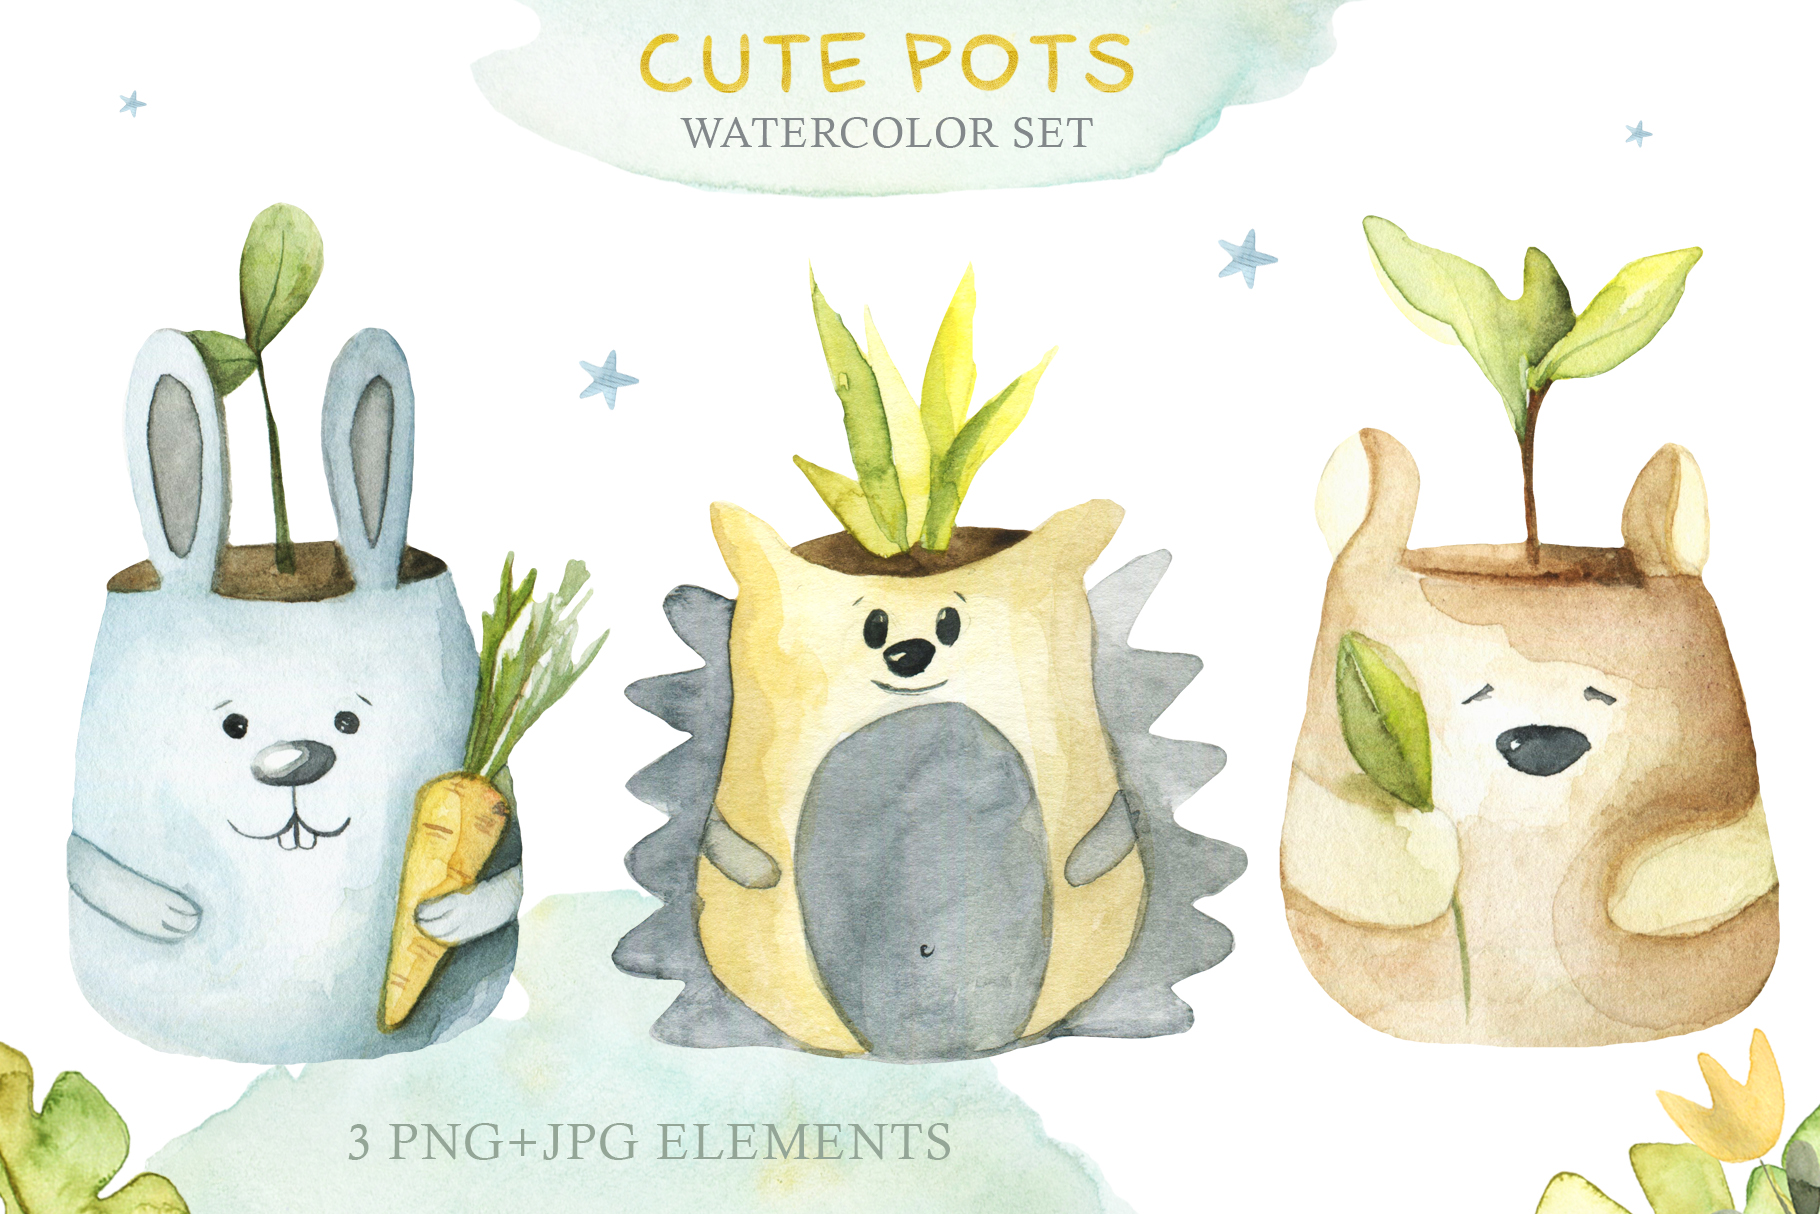 Watercolor Set Cute Pots example image 2